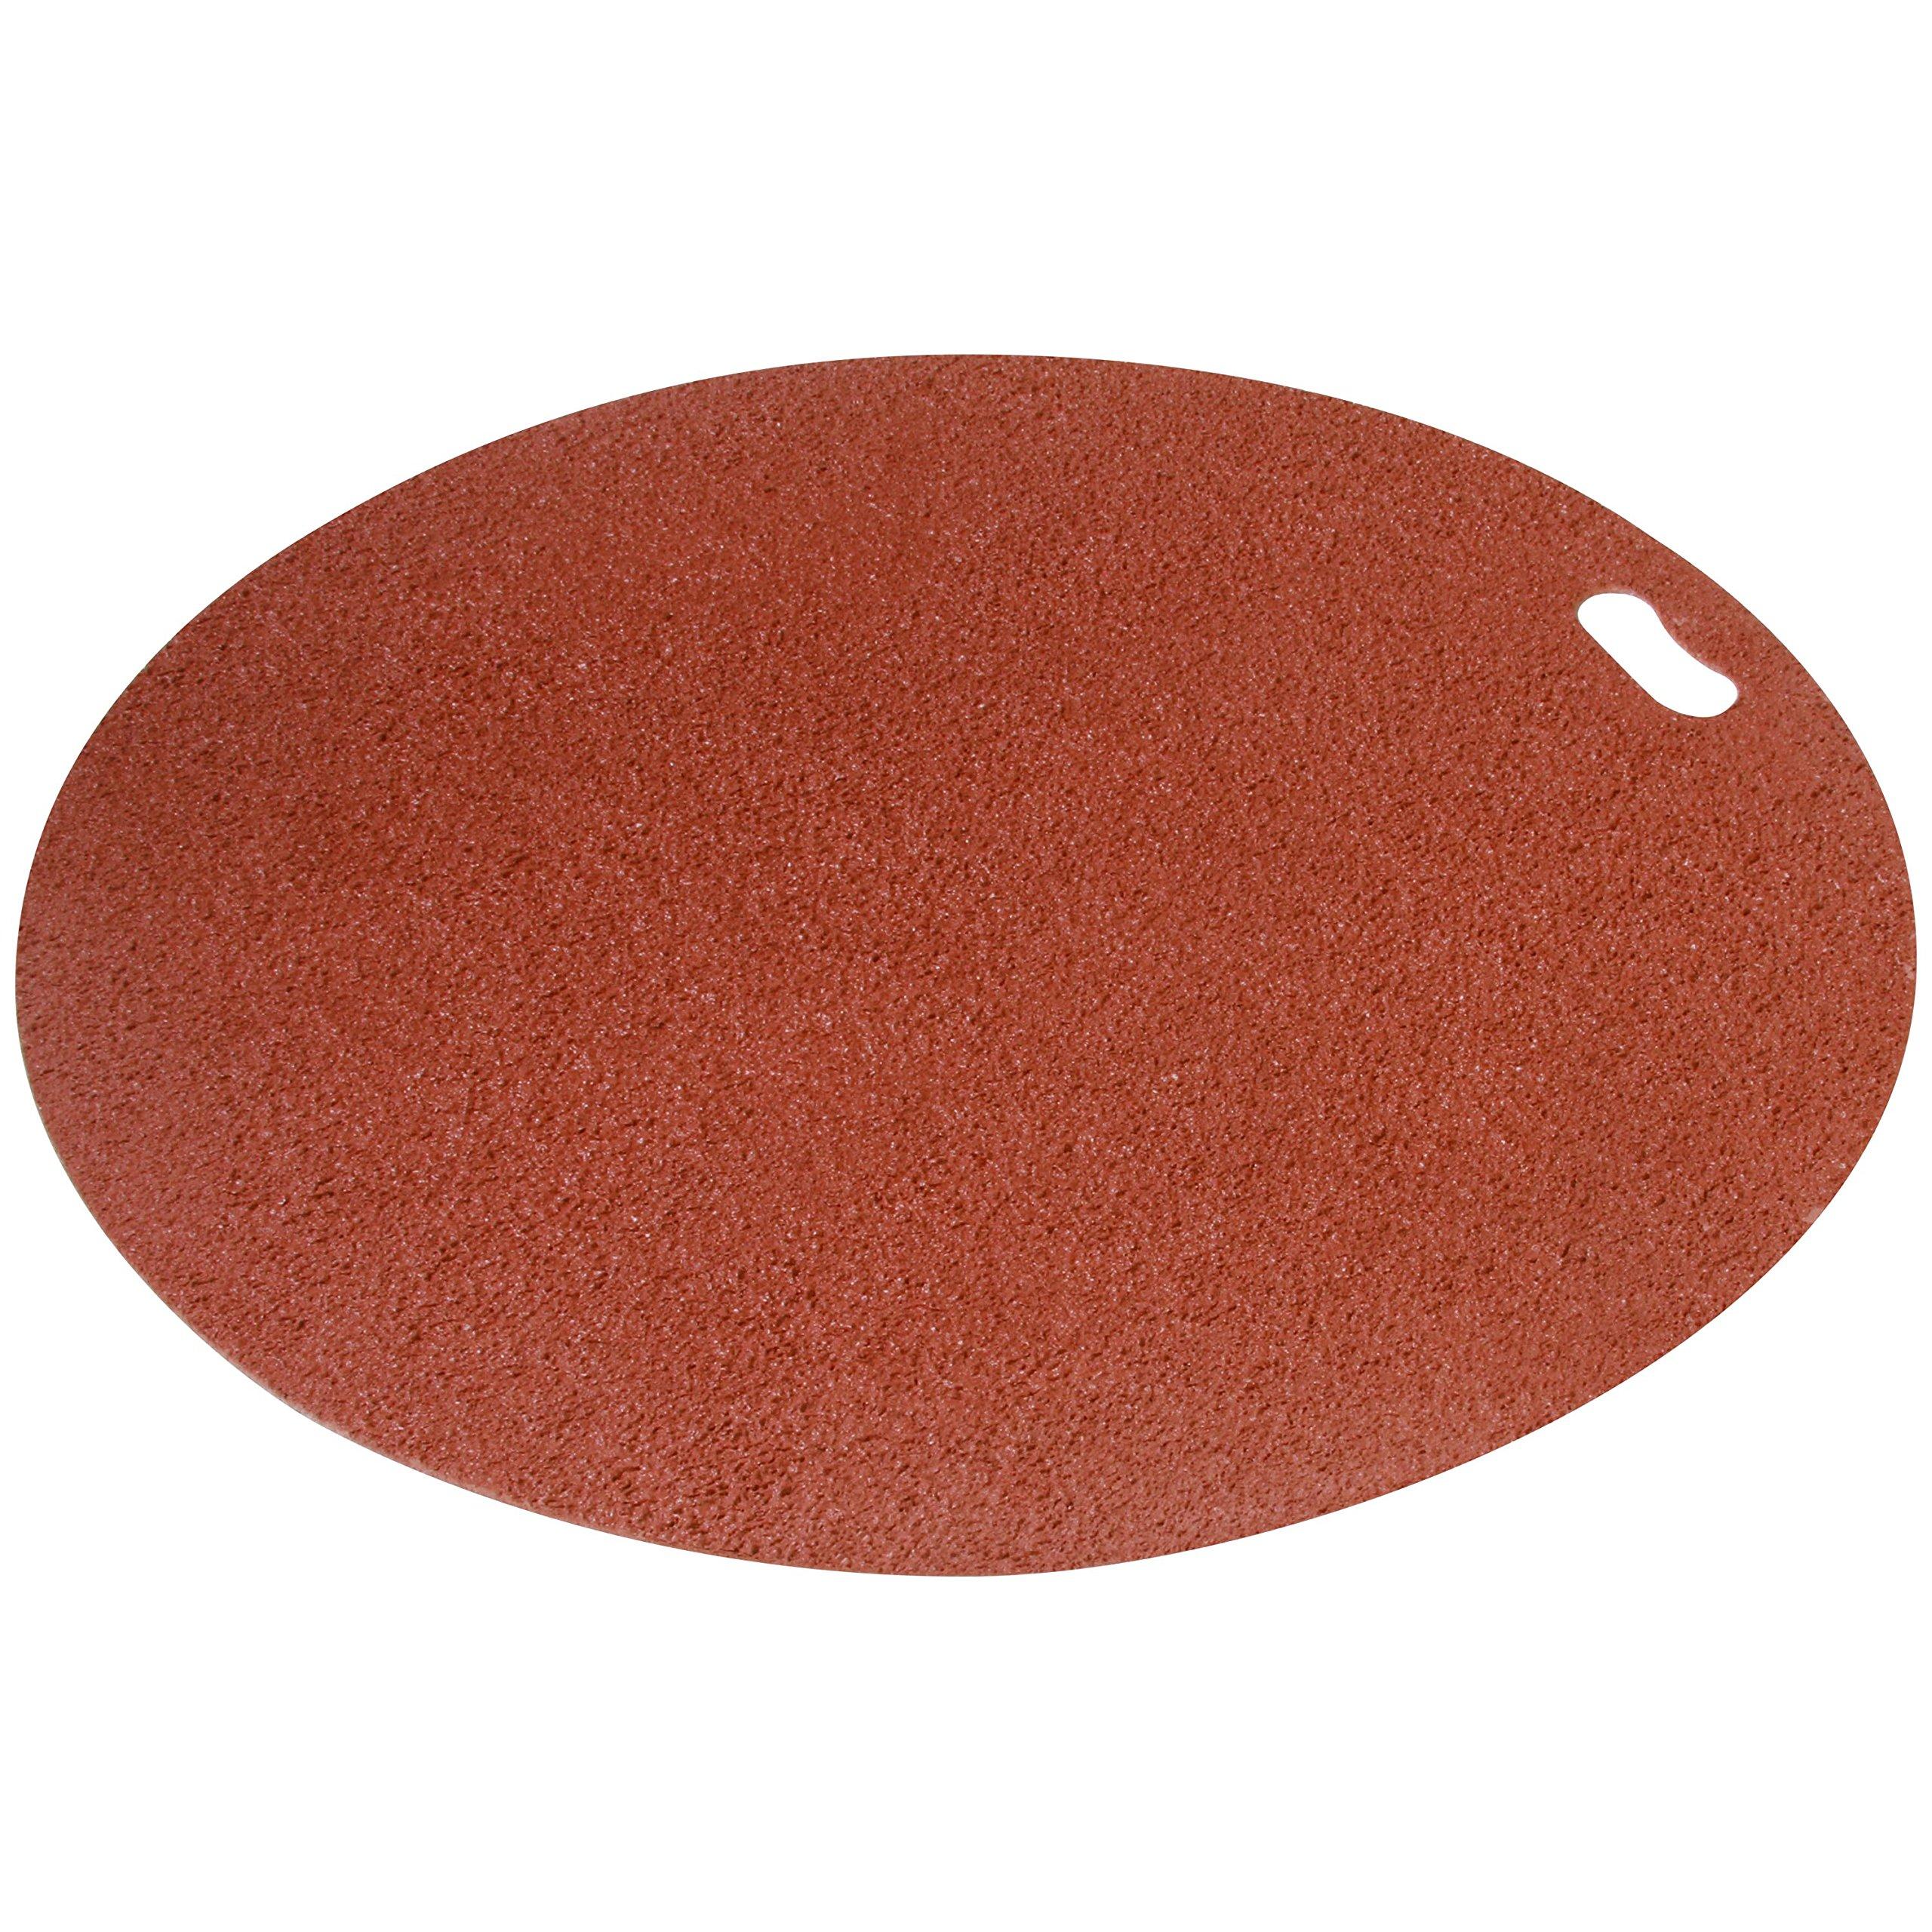 The Original Grill Pad Brick Grill Pad, Round